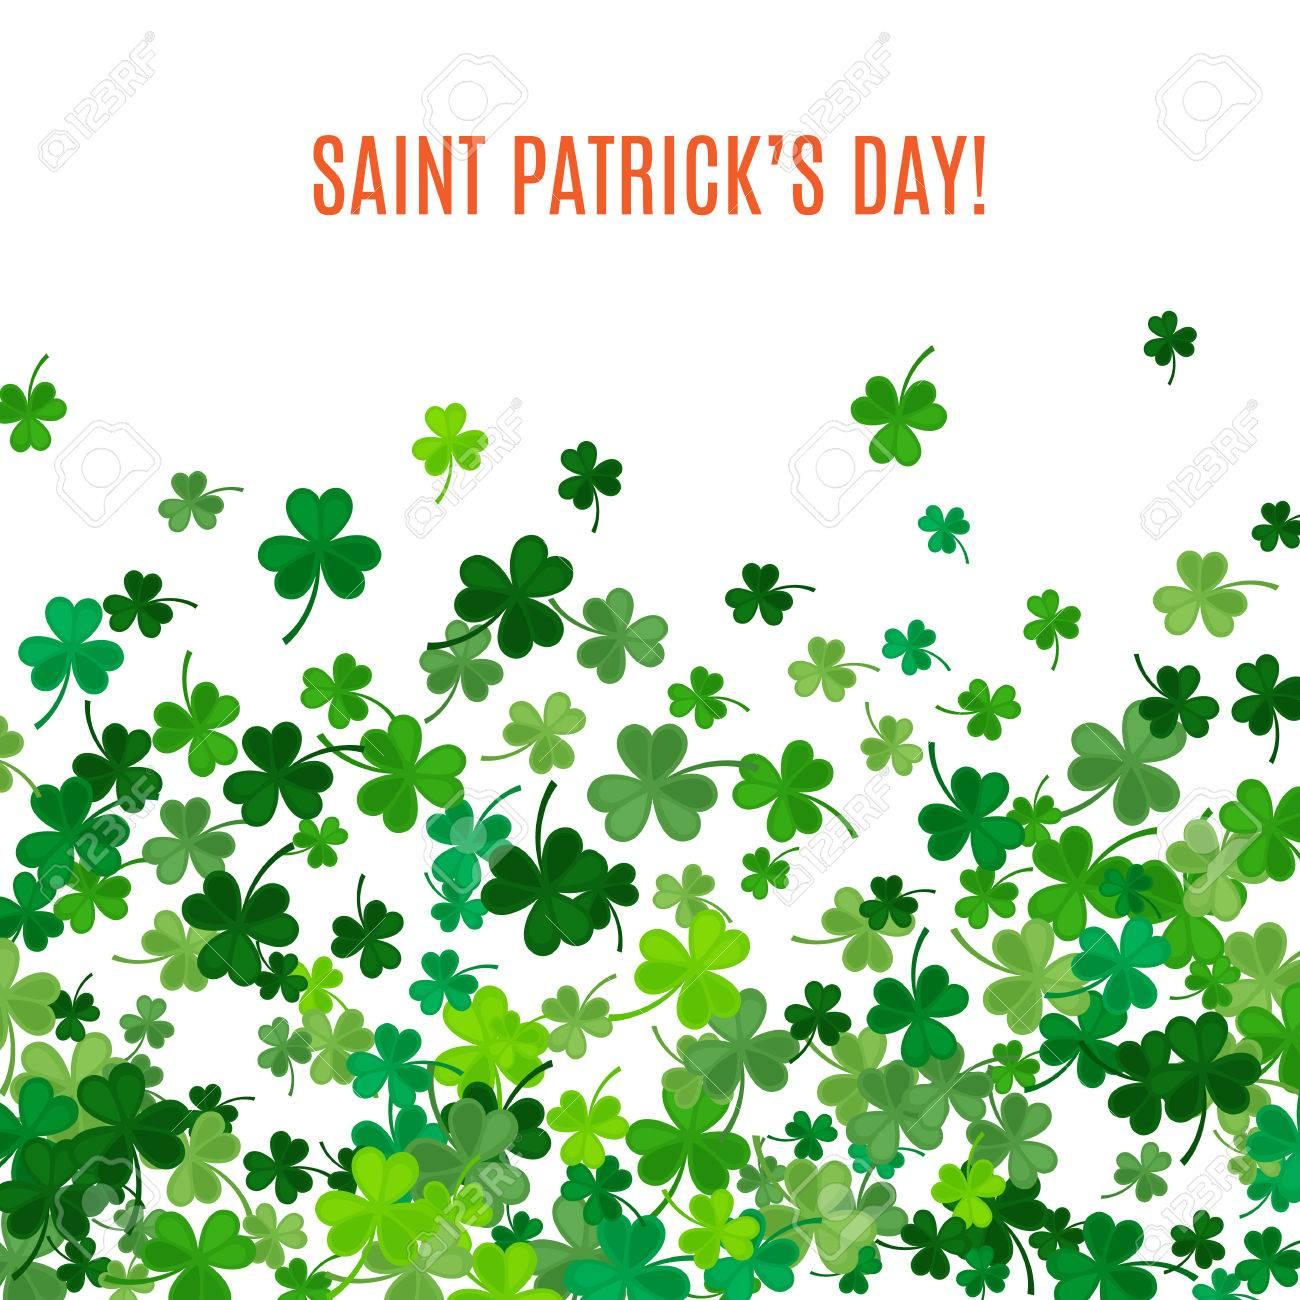 st patricks day background illustration for lucky spring design